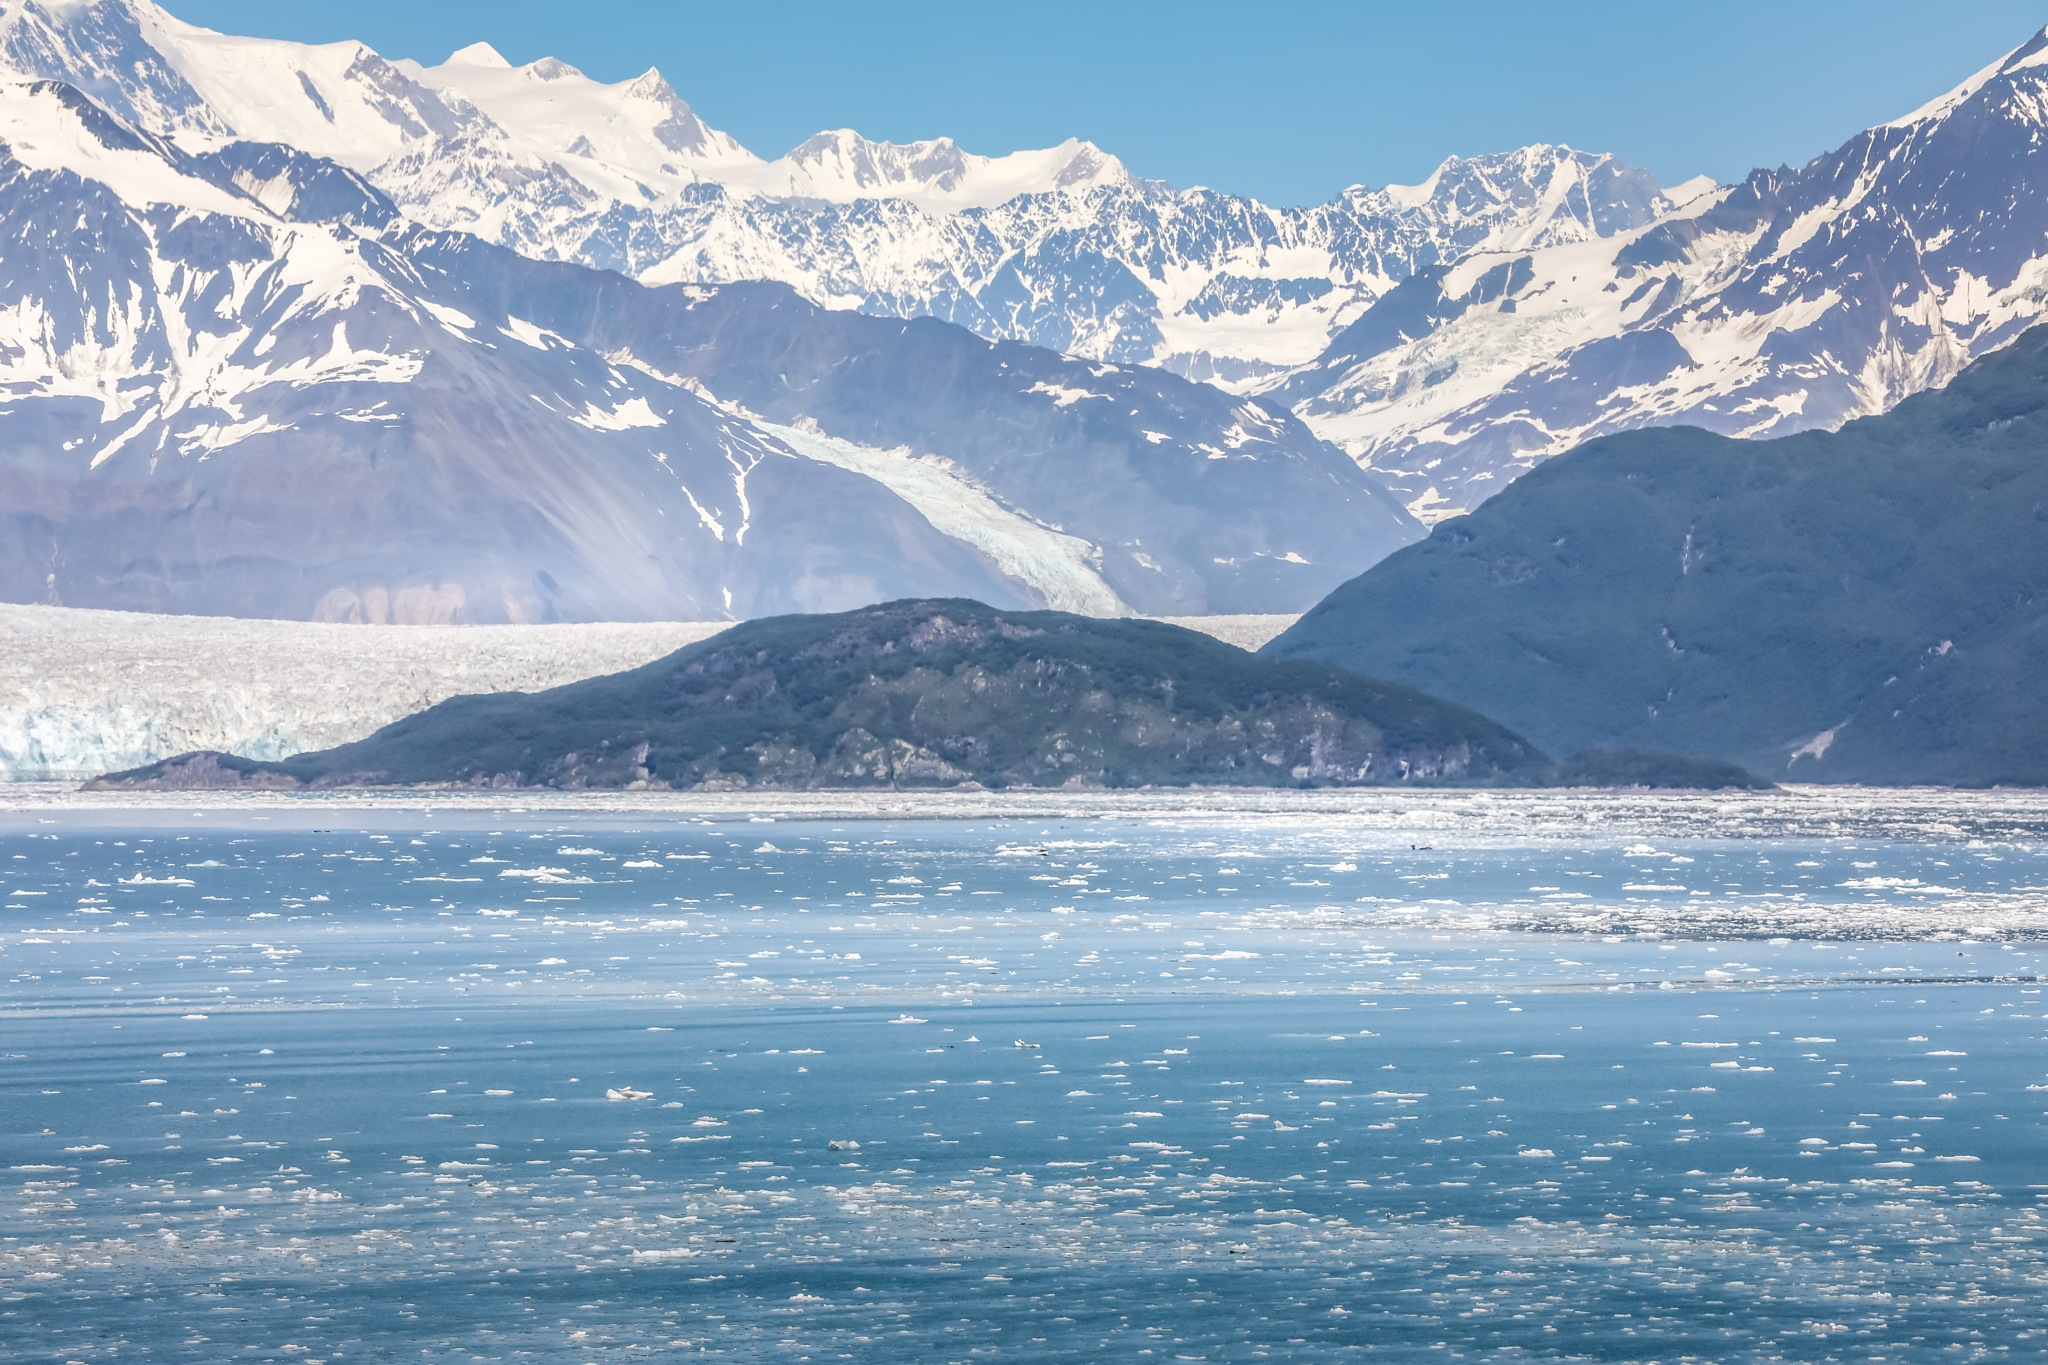 Hubbard Glacier, Alaska by Martina Birnbaum